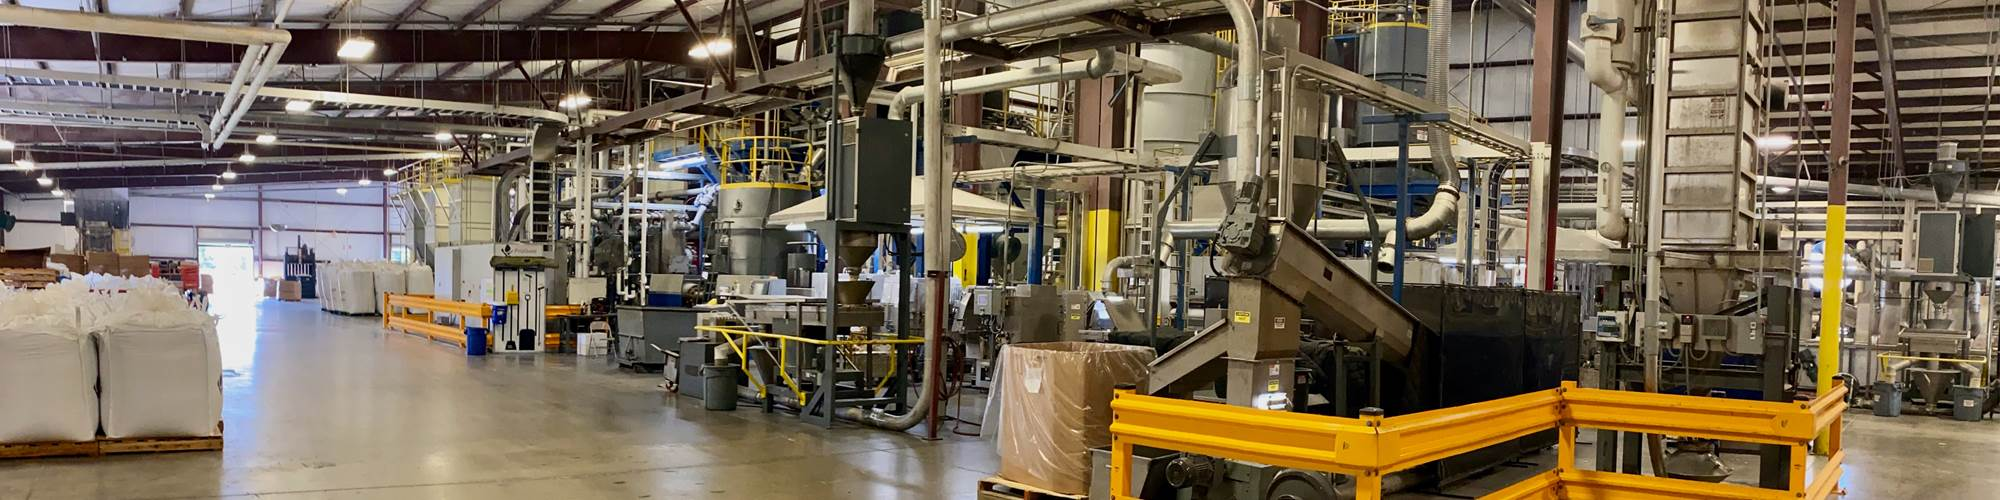 polyquest inside facility